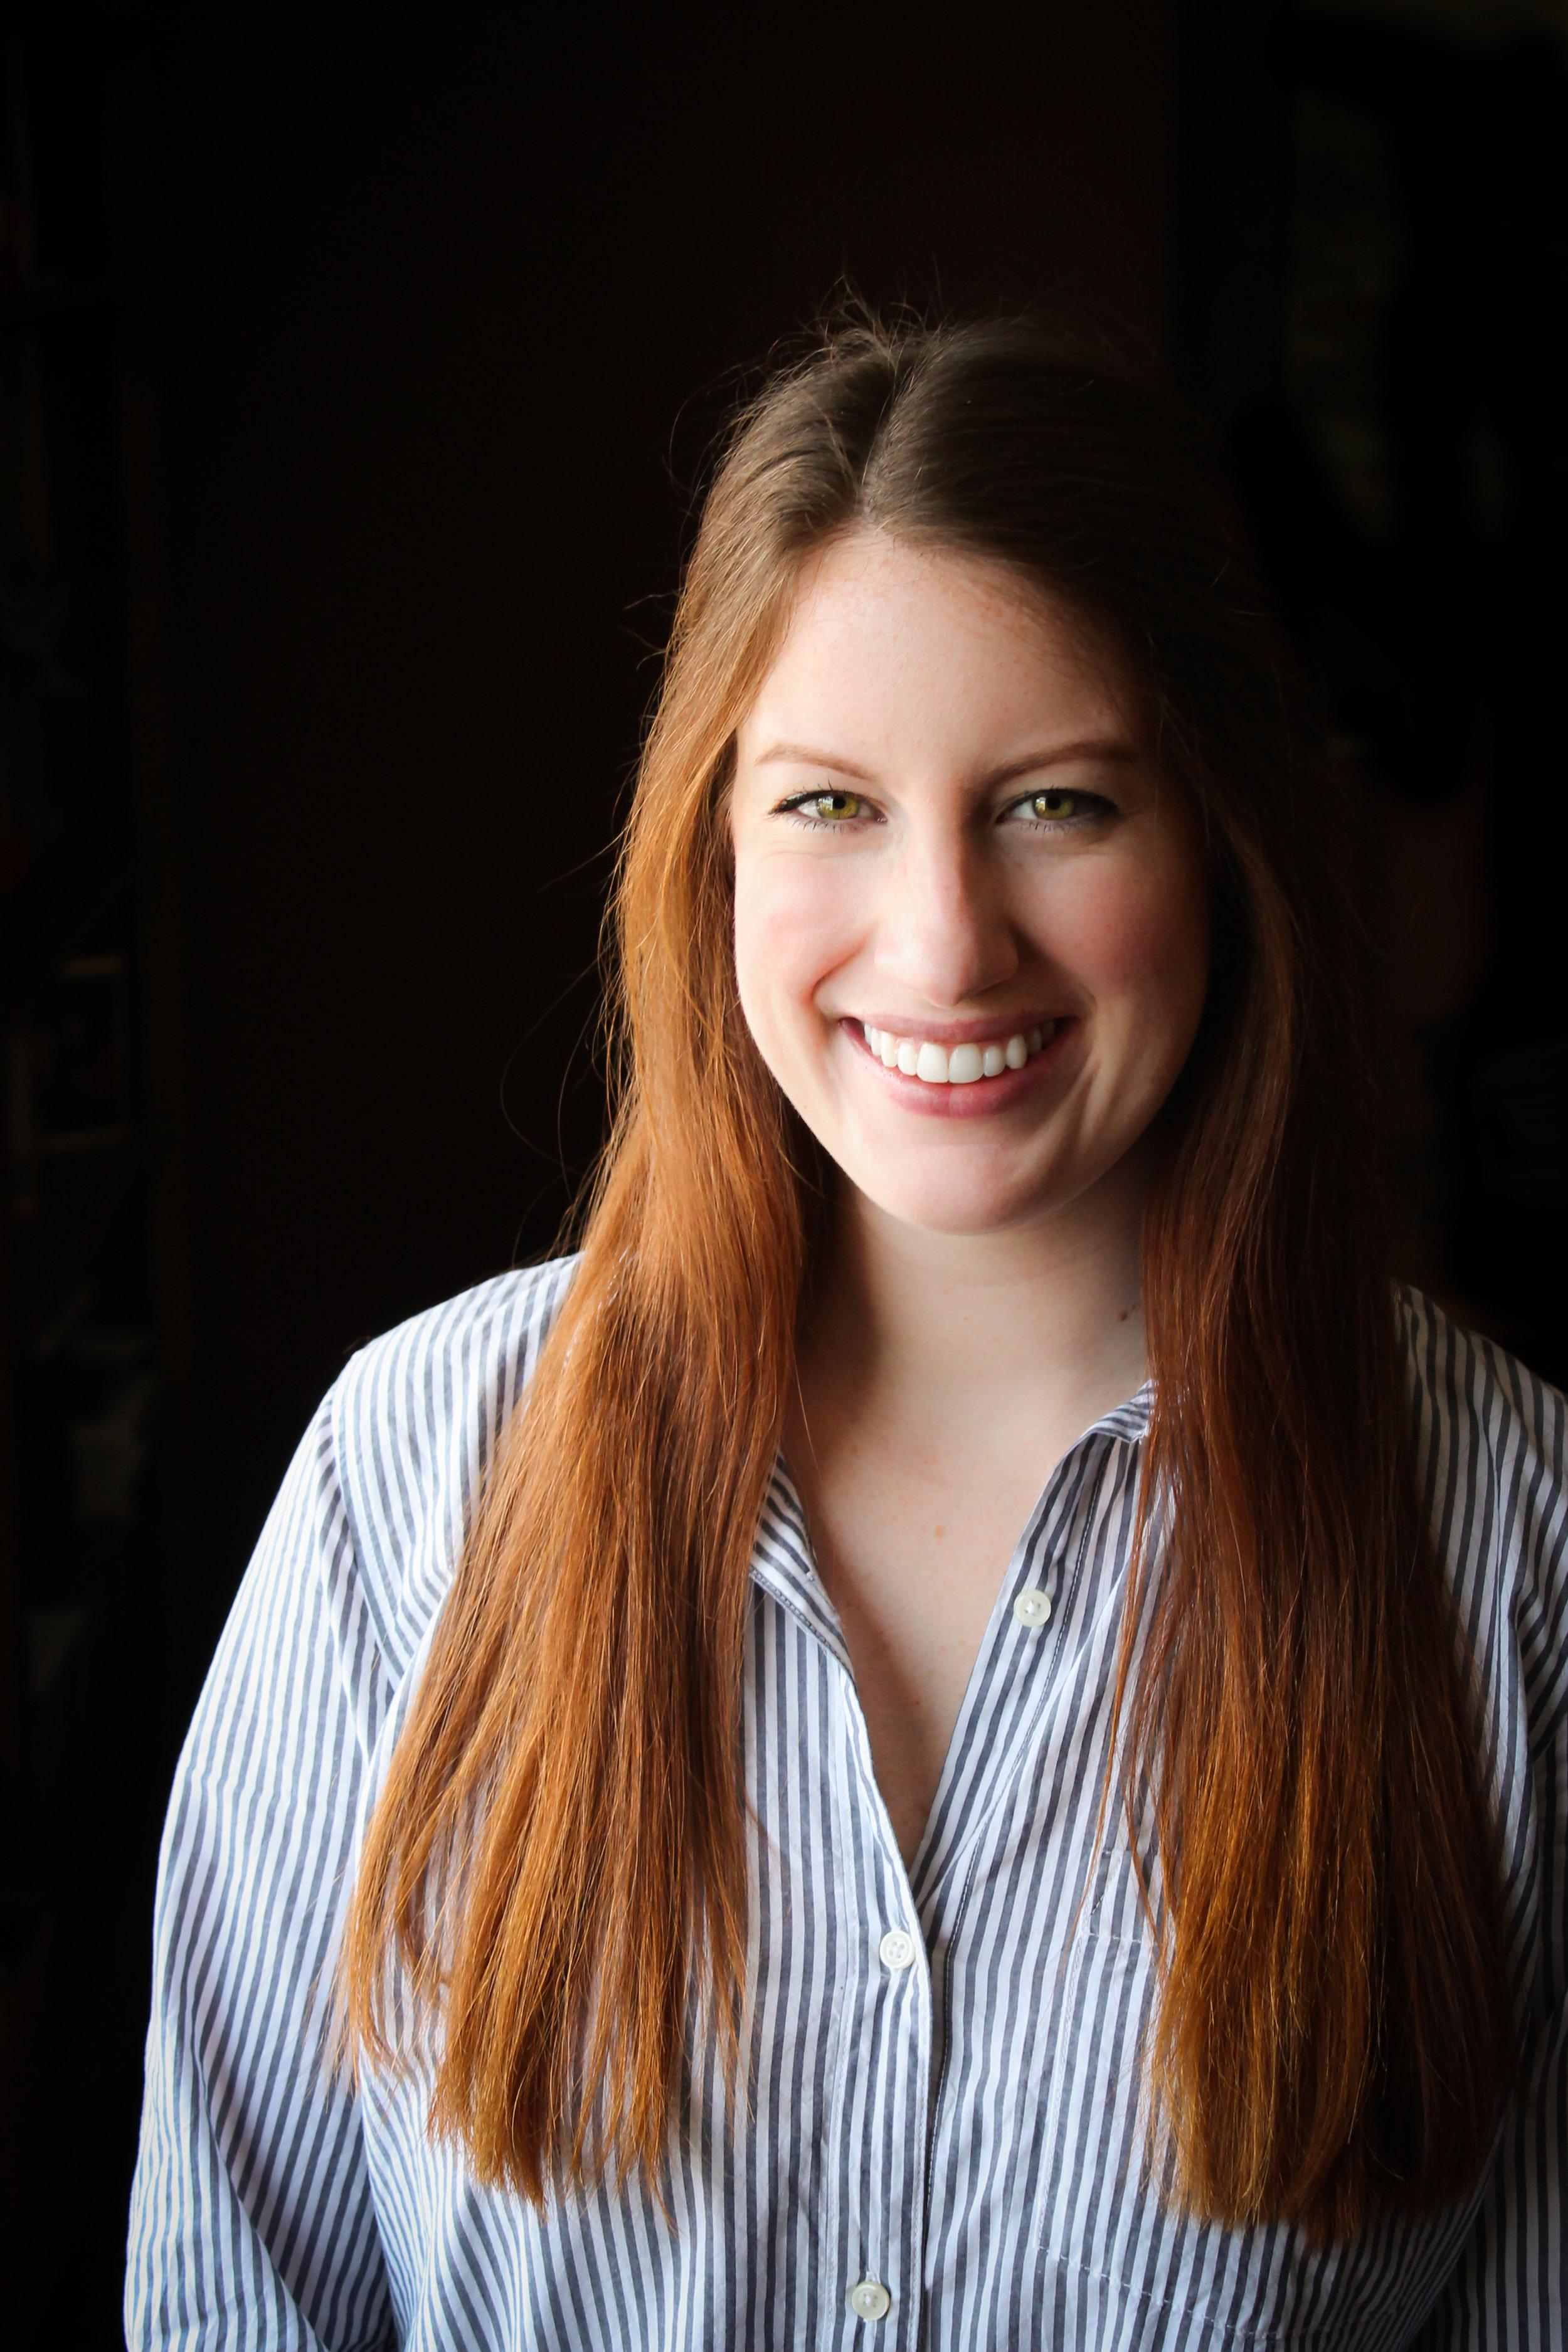 Karoline Ott, Content Coordinator